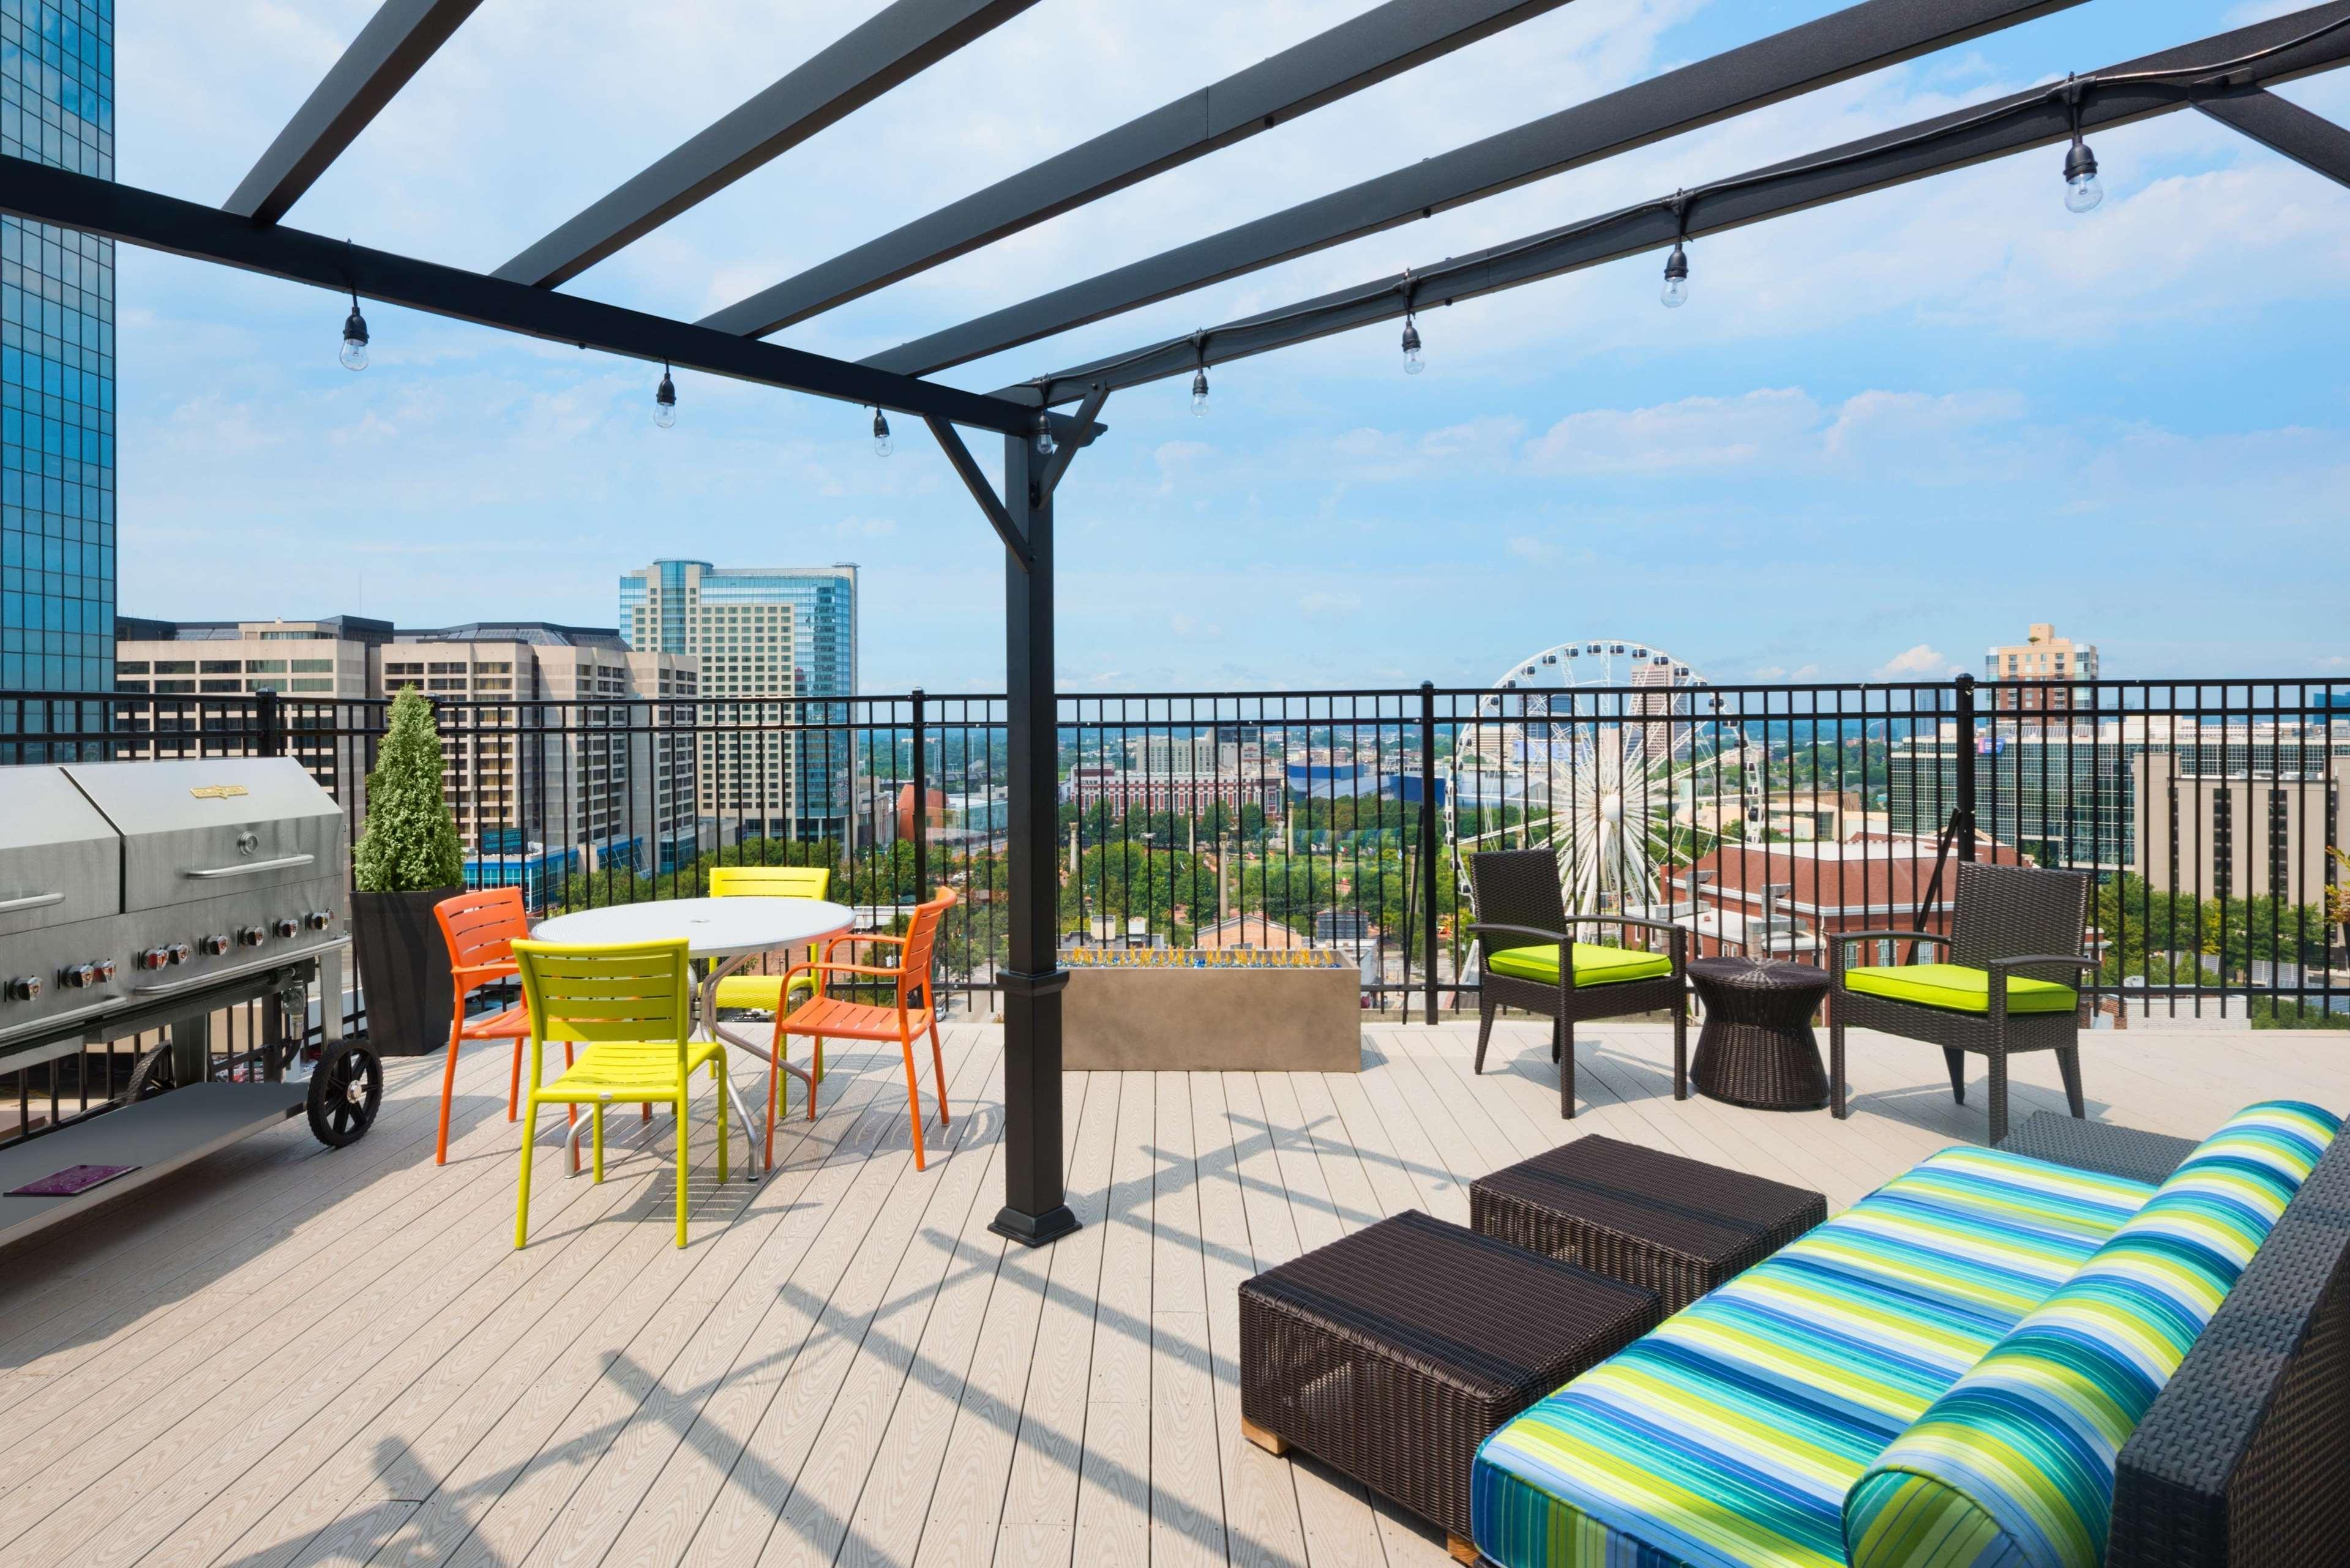 Home2 Suites by Hilton Atlanta Downtown image 33